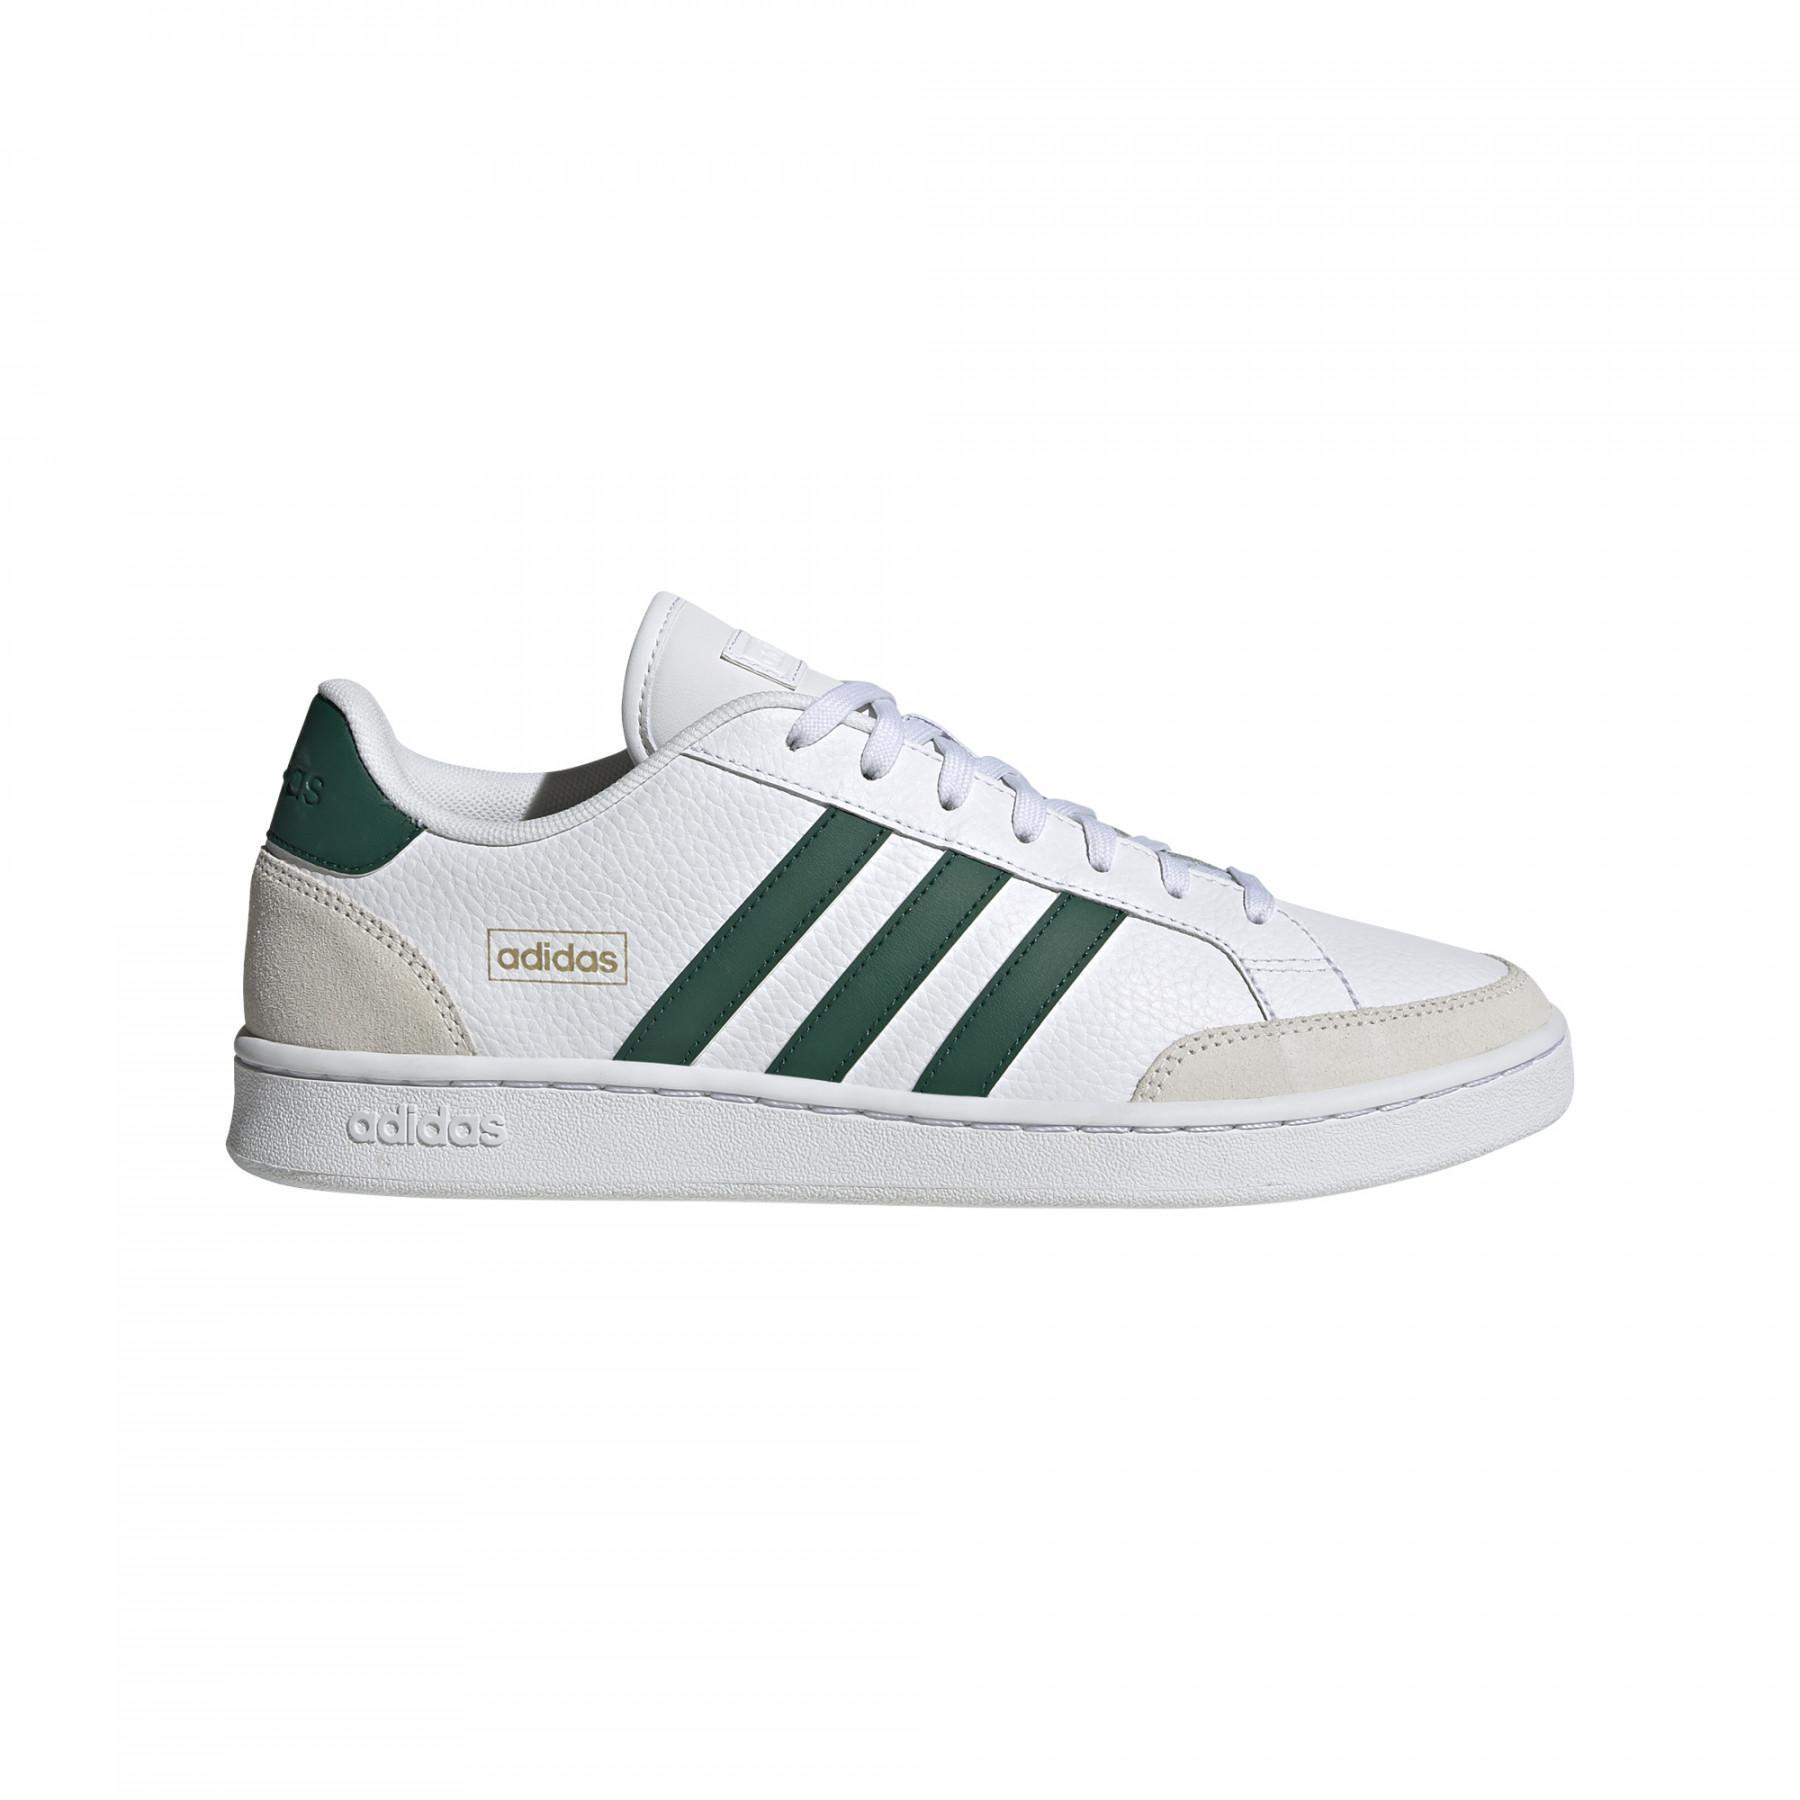 Soldes > chaussure adidas verte > en stock